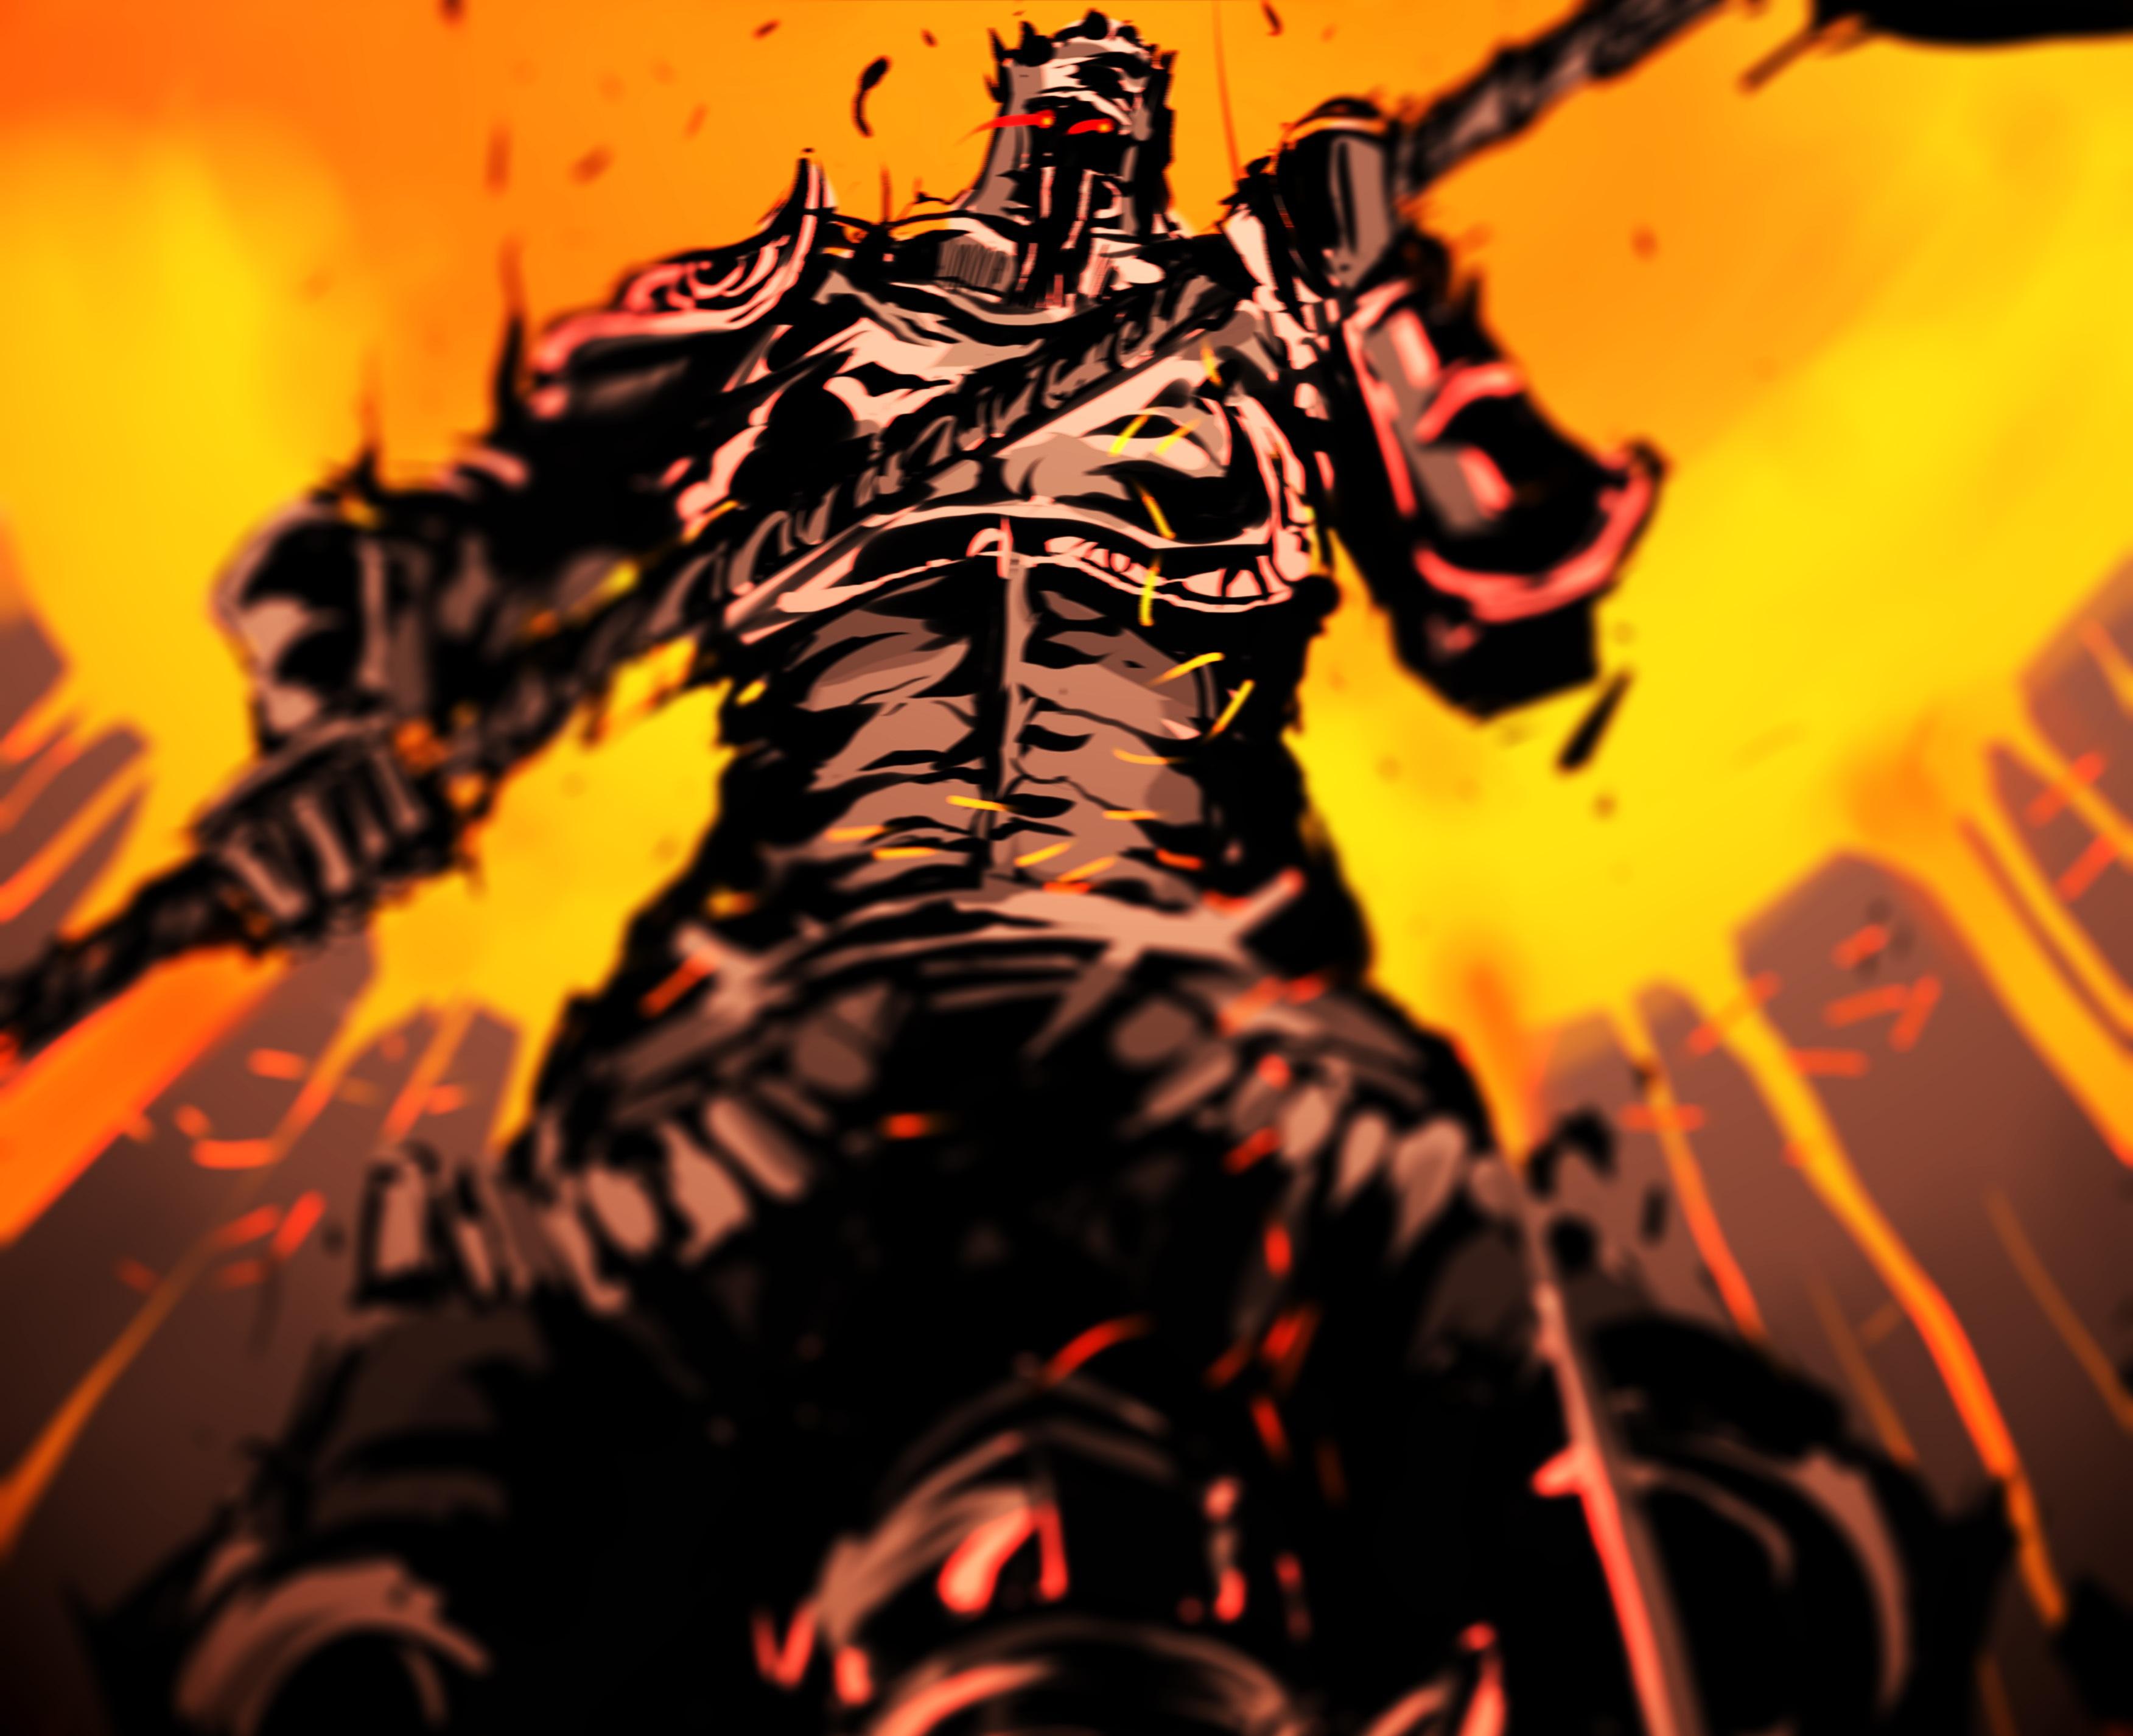 Video Game Dark Souls Iii 3504x2852